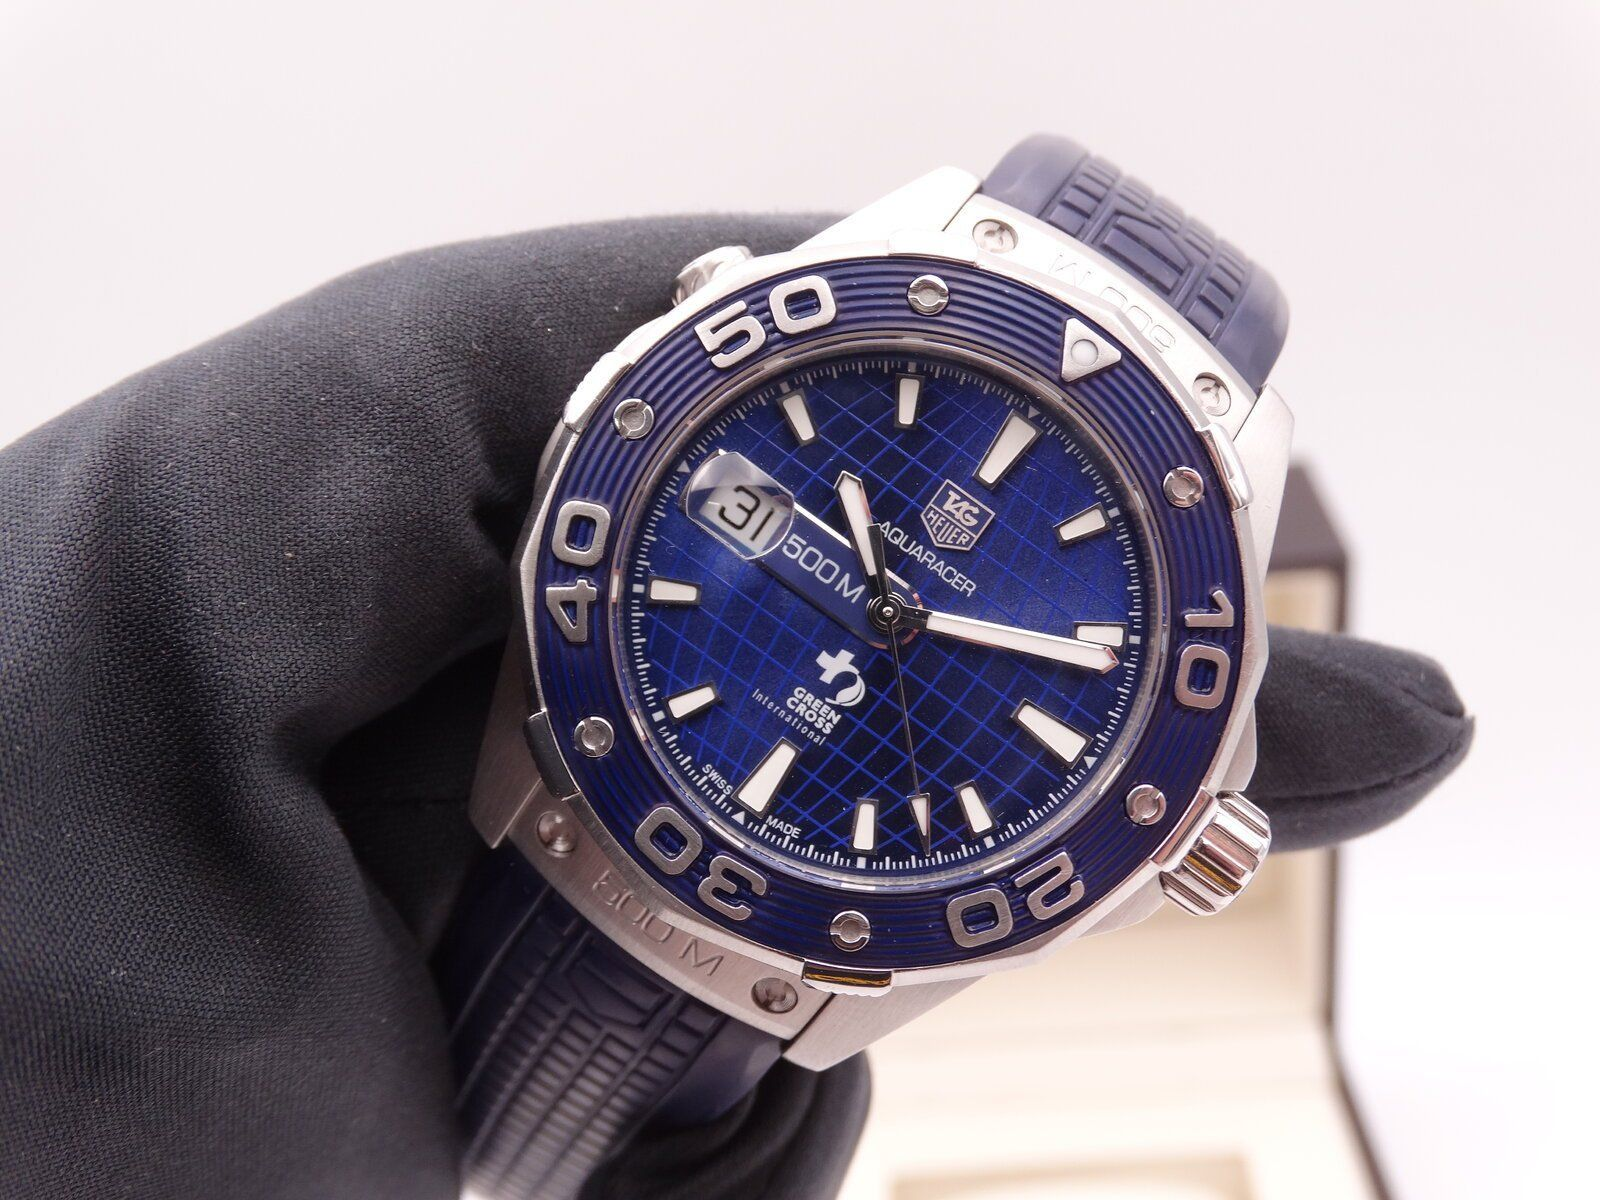 Tag Heuer Aquaracer 500 Dicaprio Green cross Blue Limited 01273.JPG